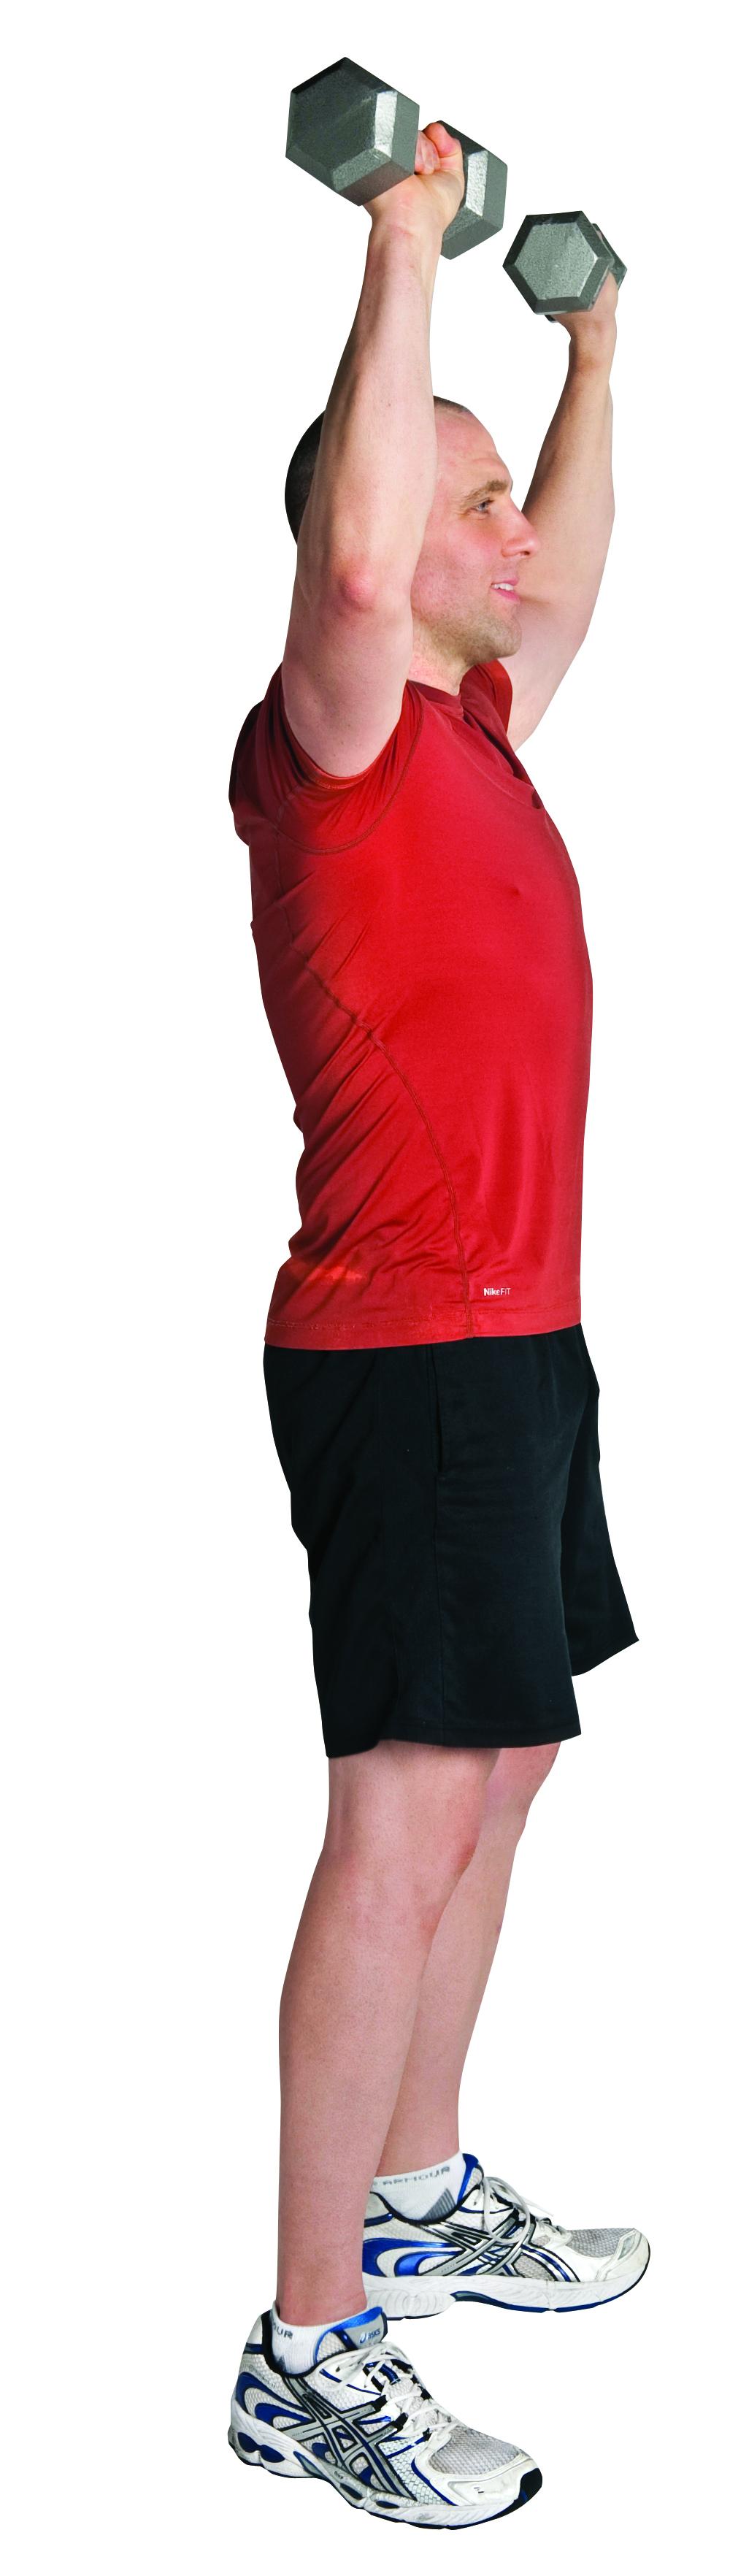 BSA Fitness Squat and Press